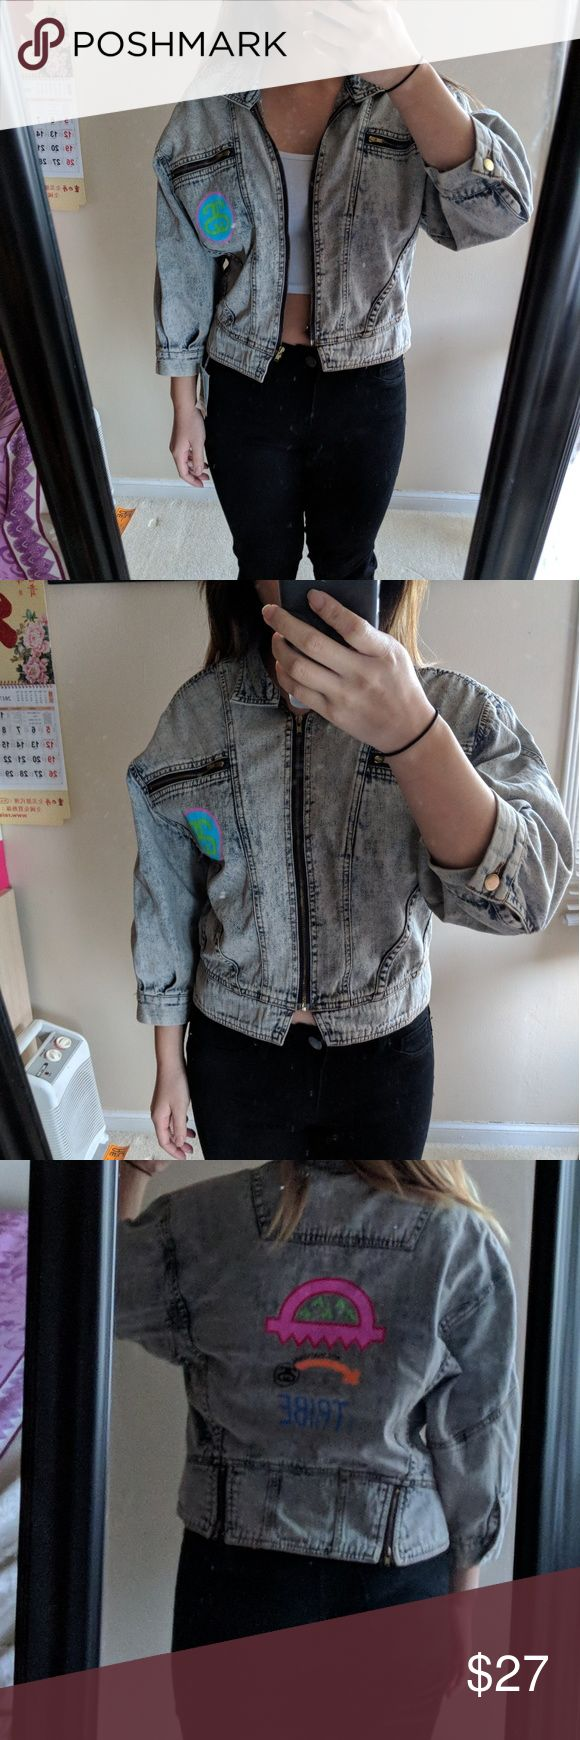 Stussy acid wash jean moto jacket Cassette Playa X Stussy Tribe. Acid wash motto jean jacket. New without tags. Stussy Jackets & Coats Jean Jackets